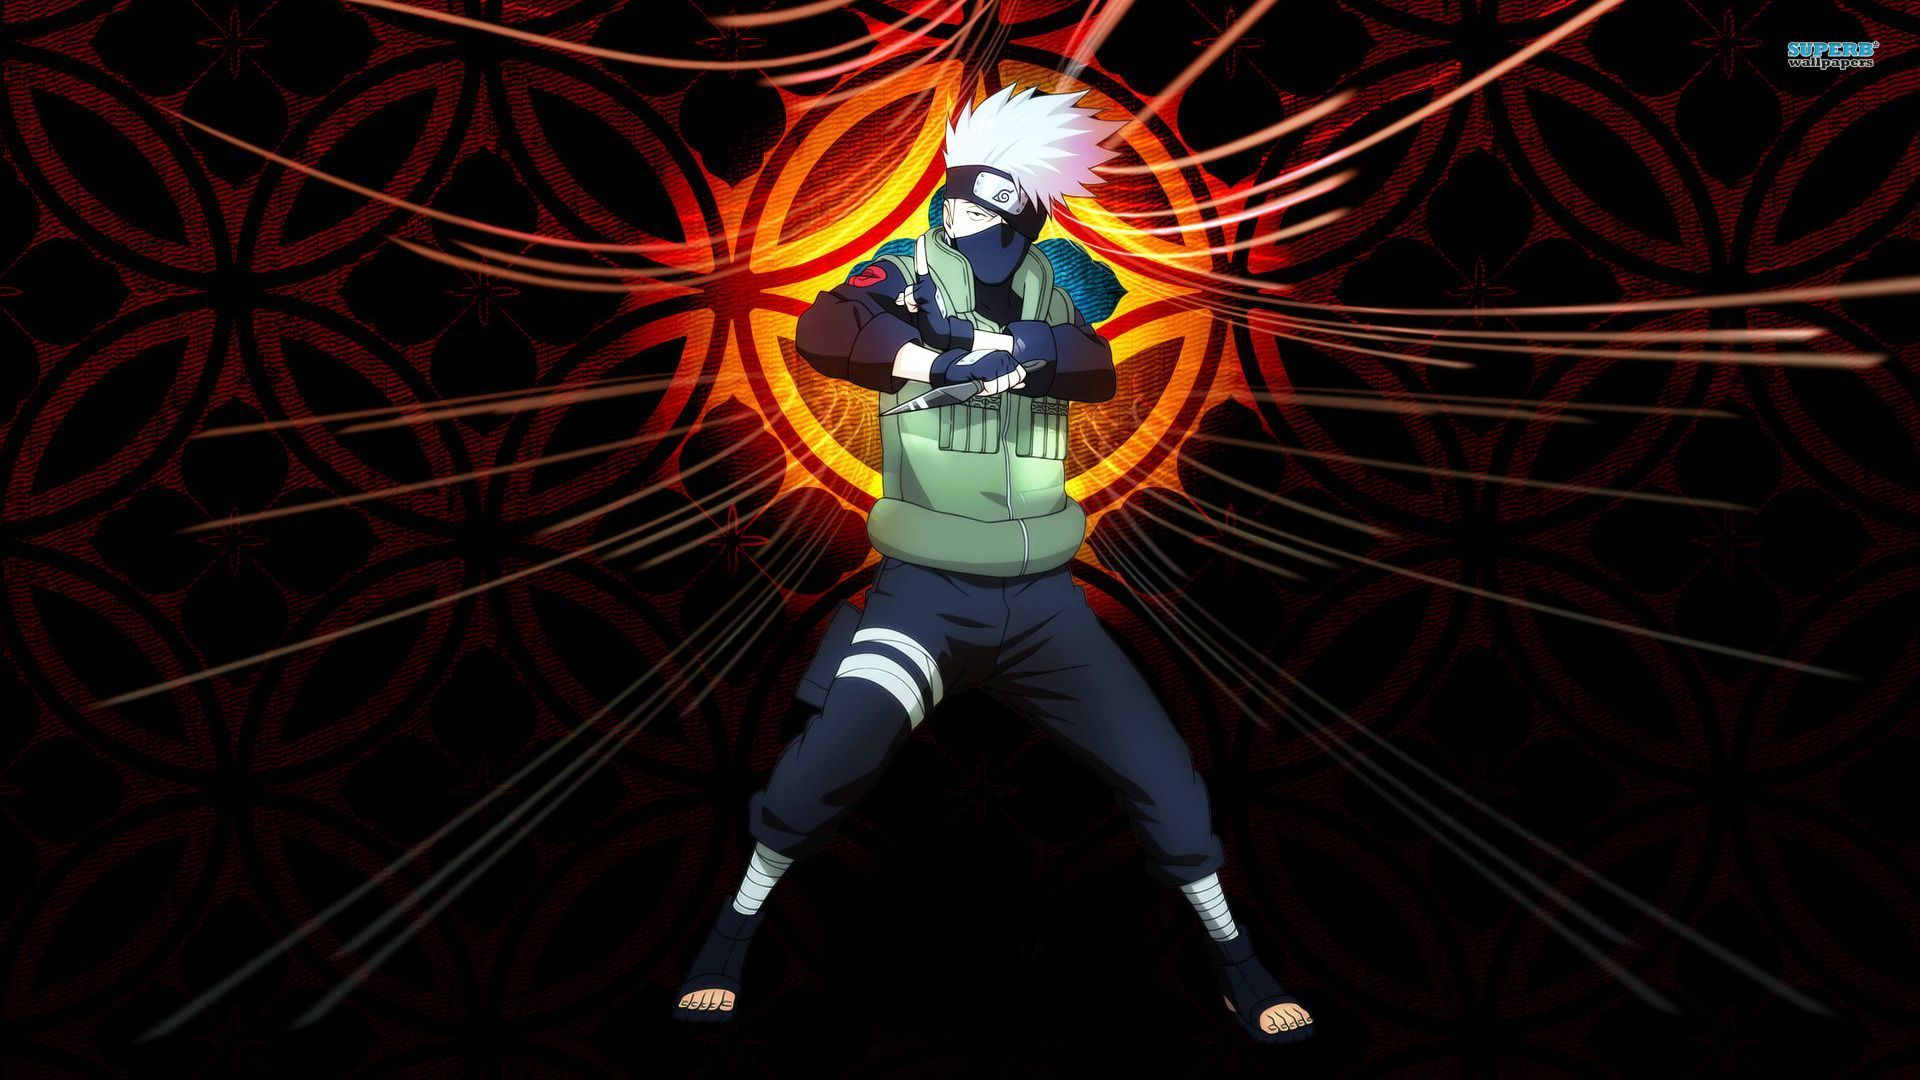 Seeking for astonishing Naruto Kakashi Wallpapers? Here we